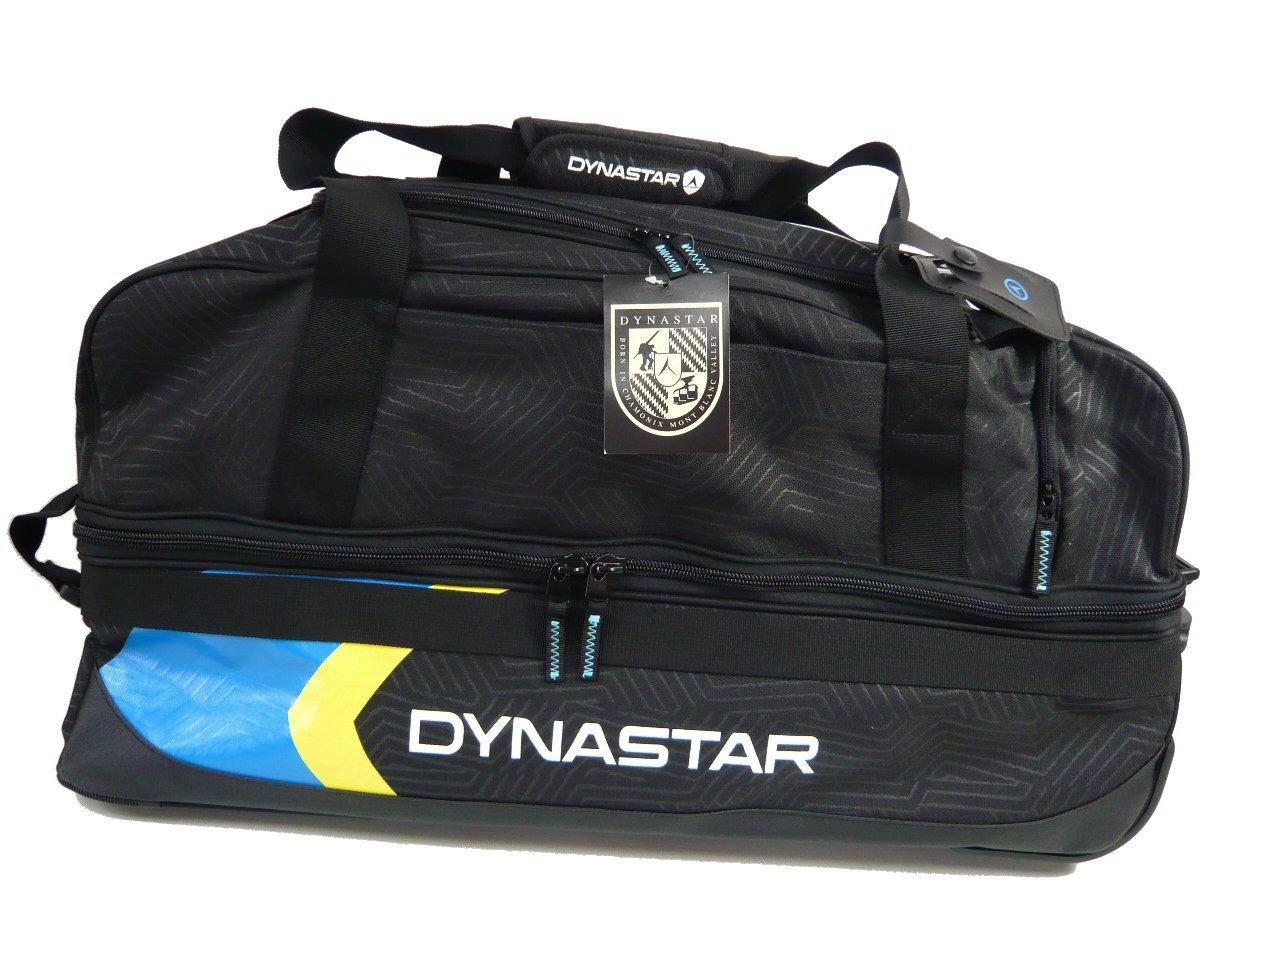 Dynastar Travel Bag